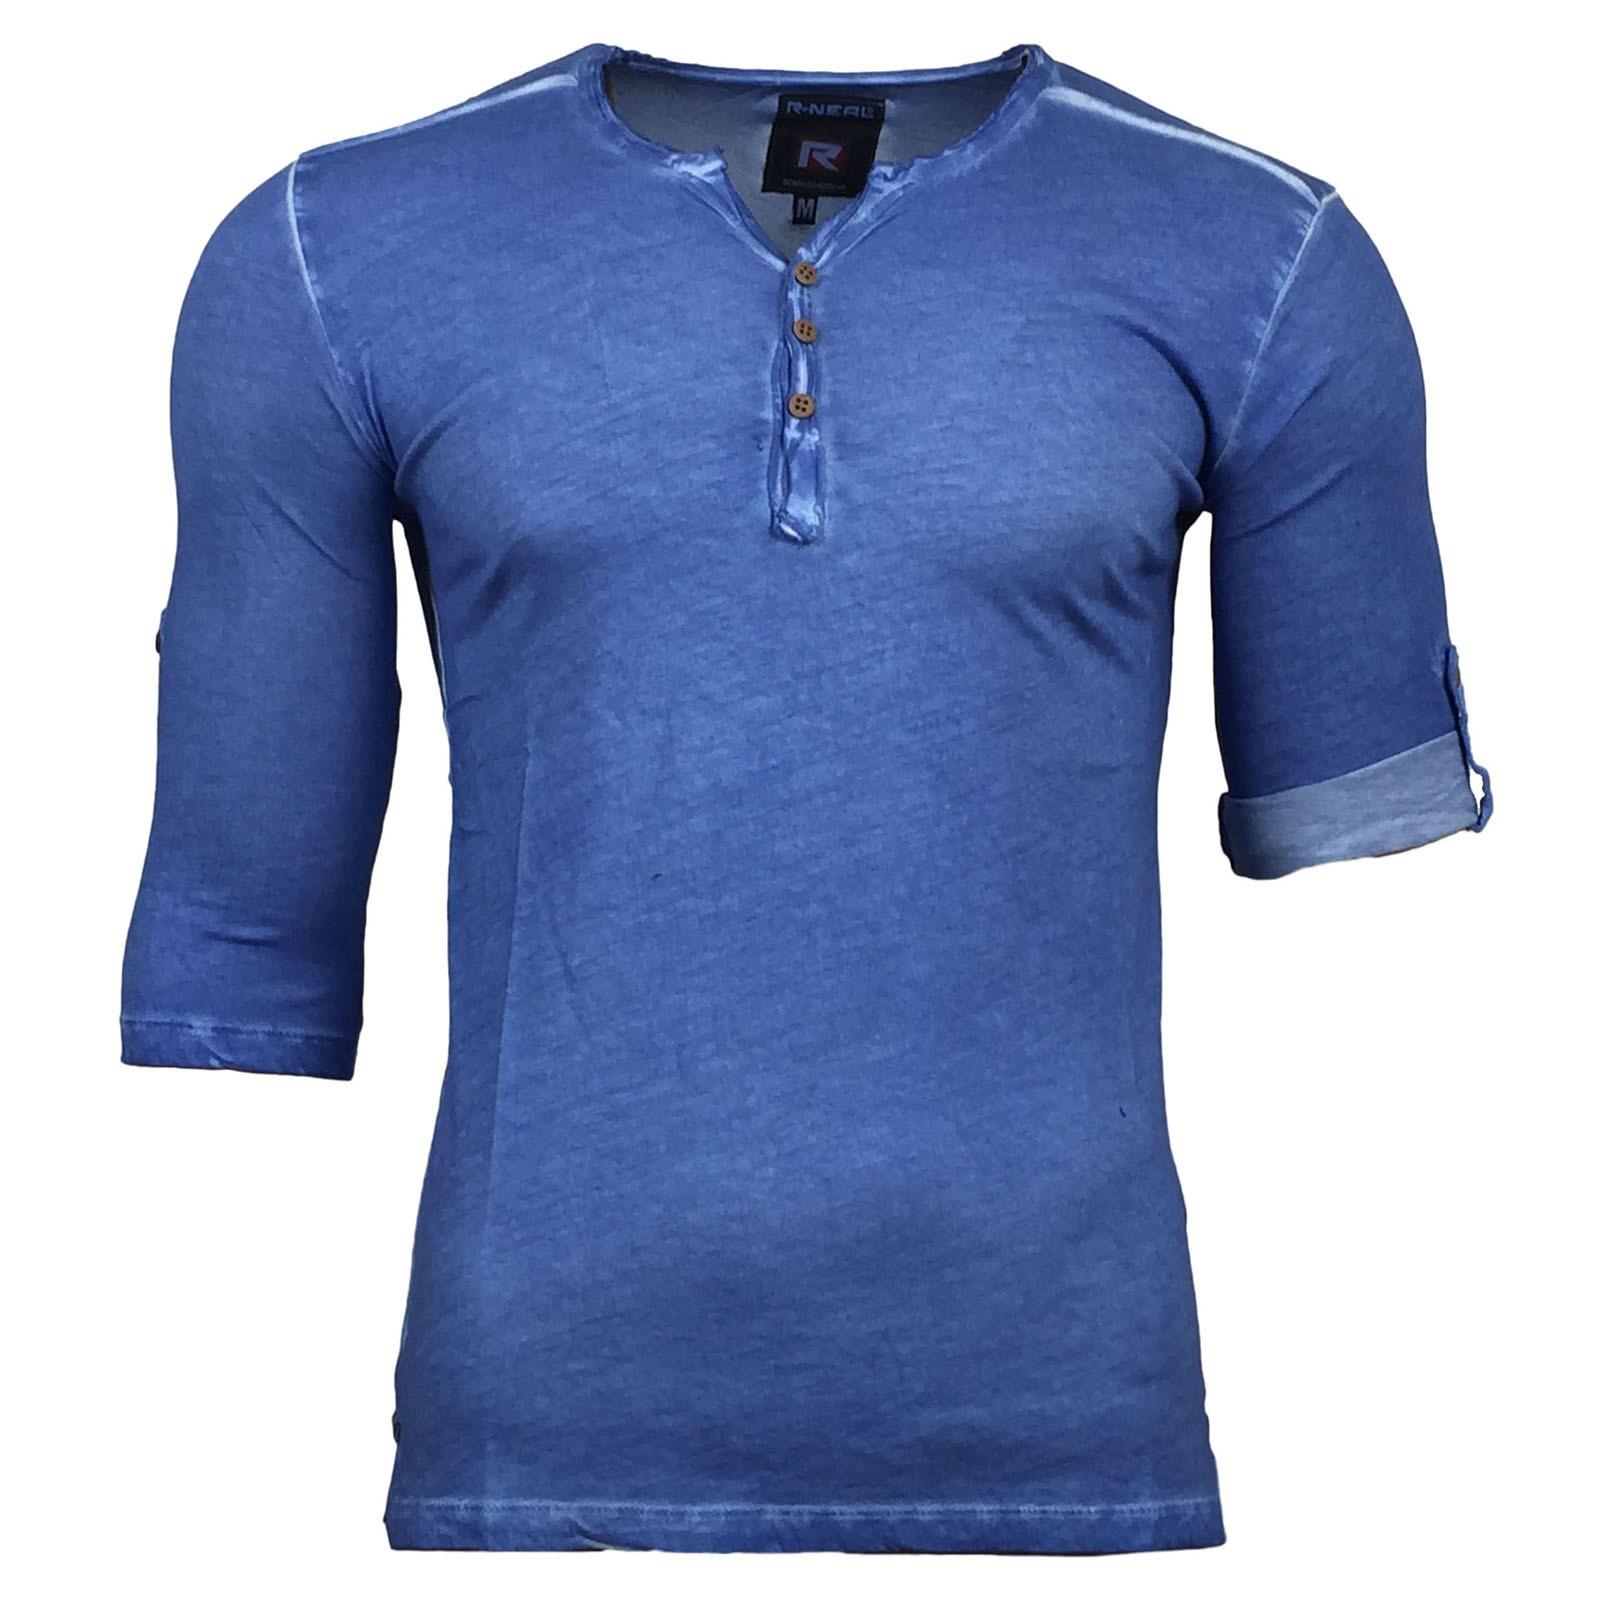 herren style rosa rot t shirt 6510 herren t shirts kurzarm. Black Bedroom Furniture Sets. Home Design Ideas